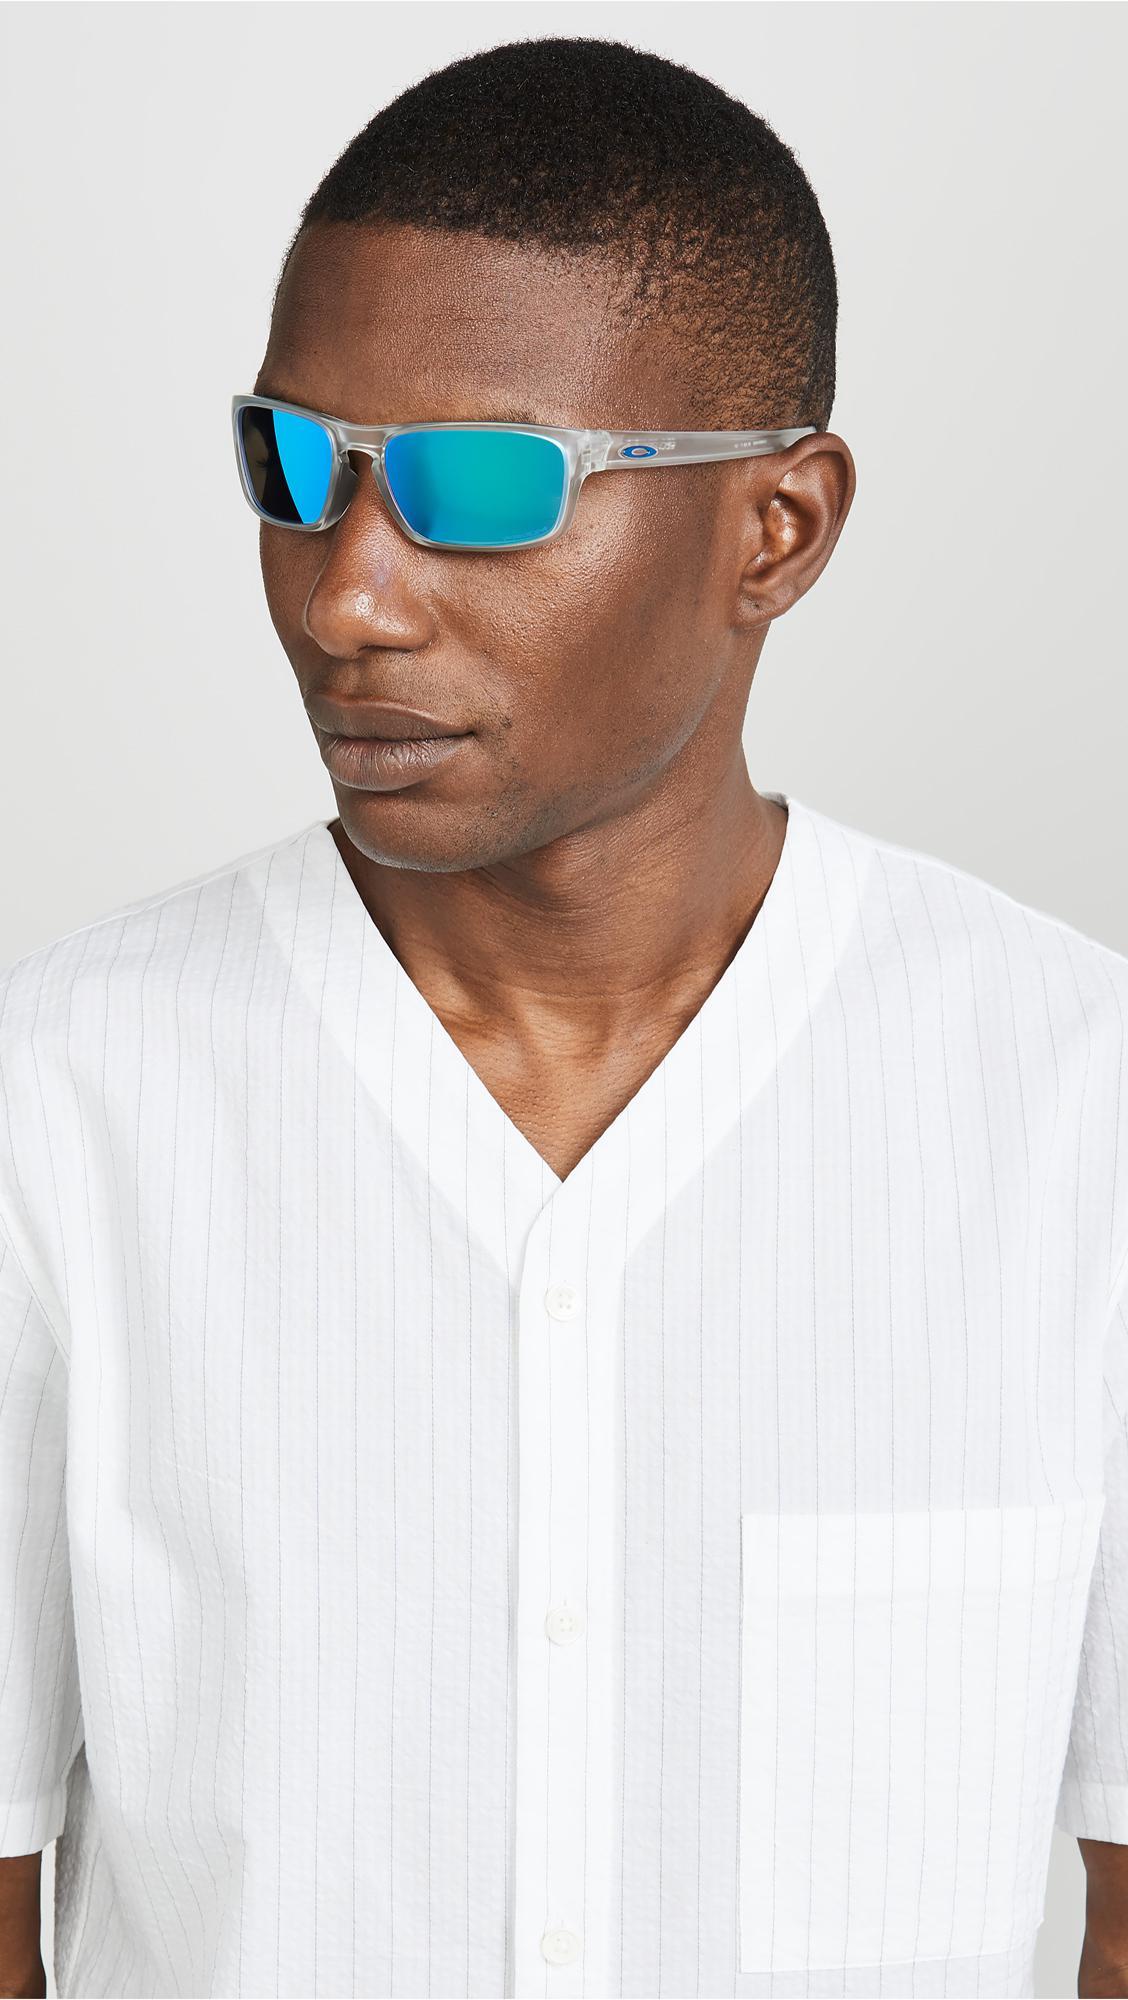 fc88de2d82cd3 Oakley - Blue Silver Stealth Sunglasses for Men - Lyst. View fullscreen